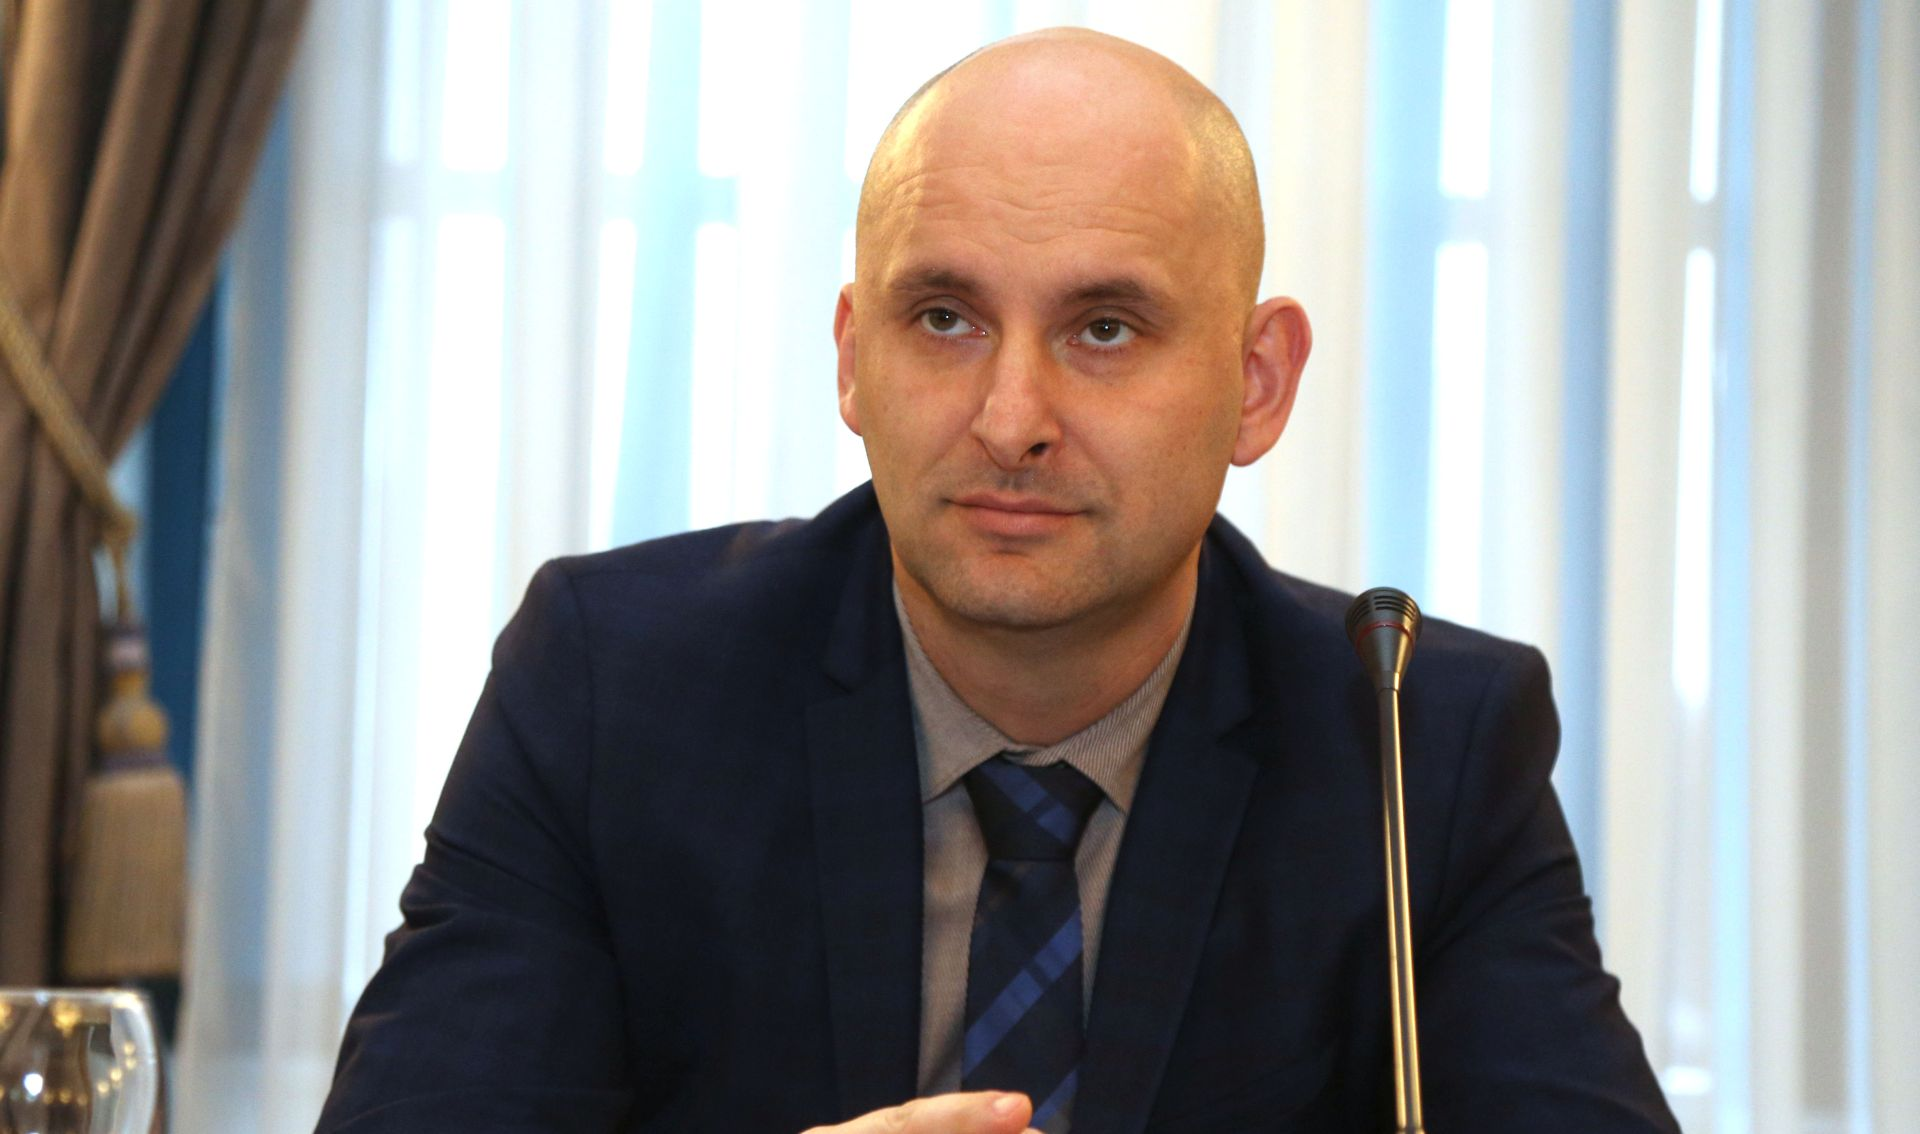 Ministar Tolušić u šibenskom Centru 112